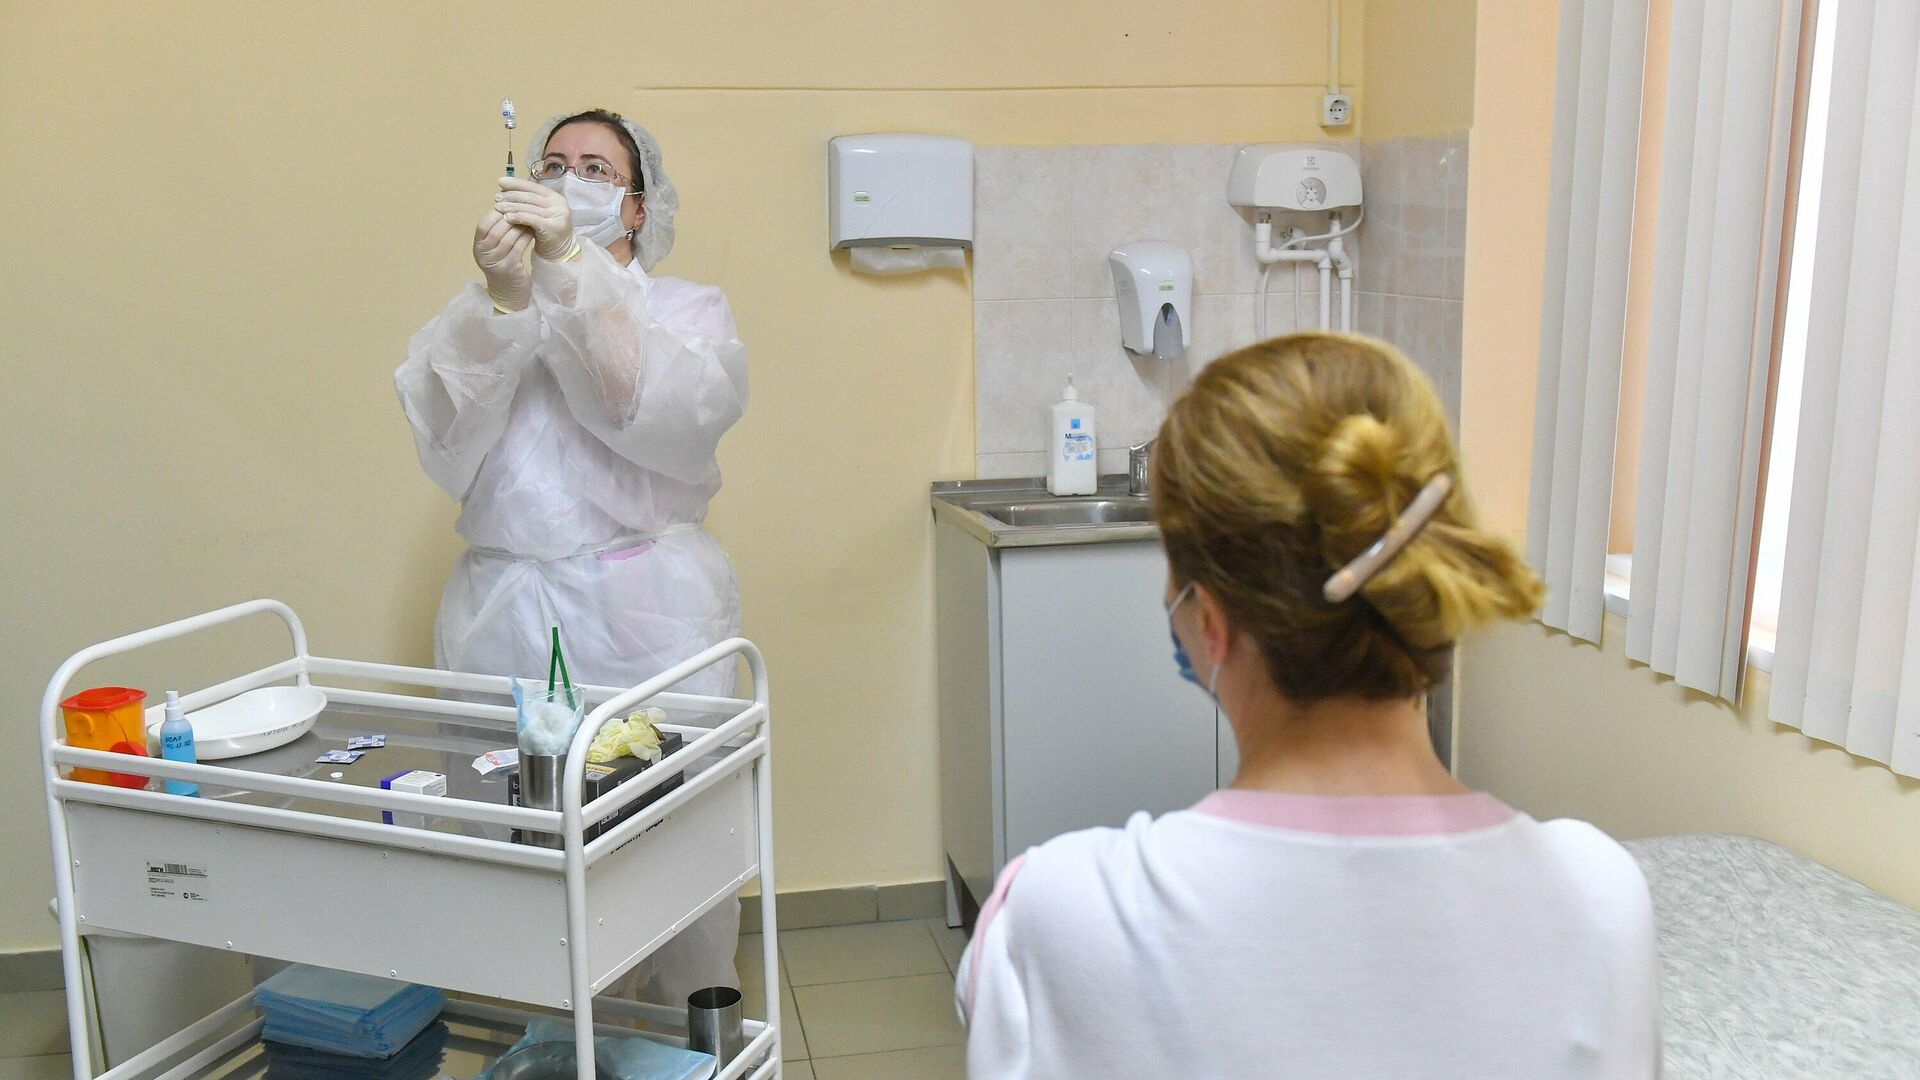 Старт масштабной вакцинации от COVID-19 в московских поликлиниках - РИА Новости, 1920, 11.12.2020